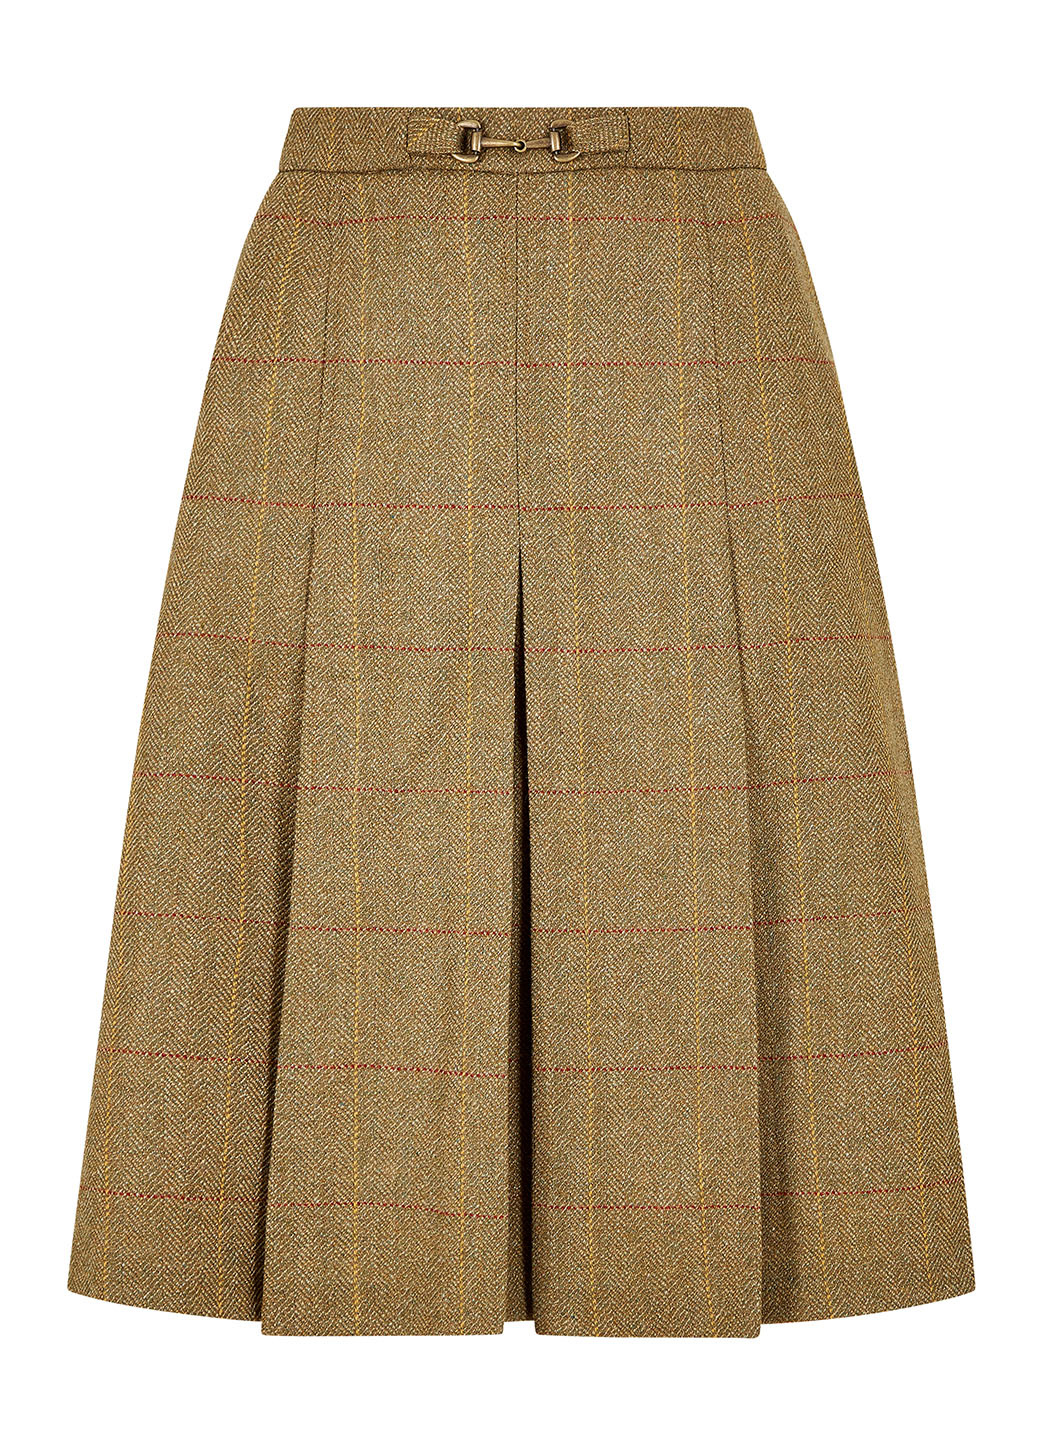 Dubarry Spruce Tweed Rok - Elm-1